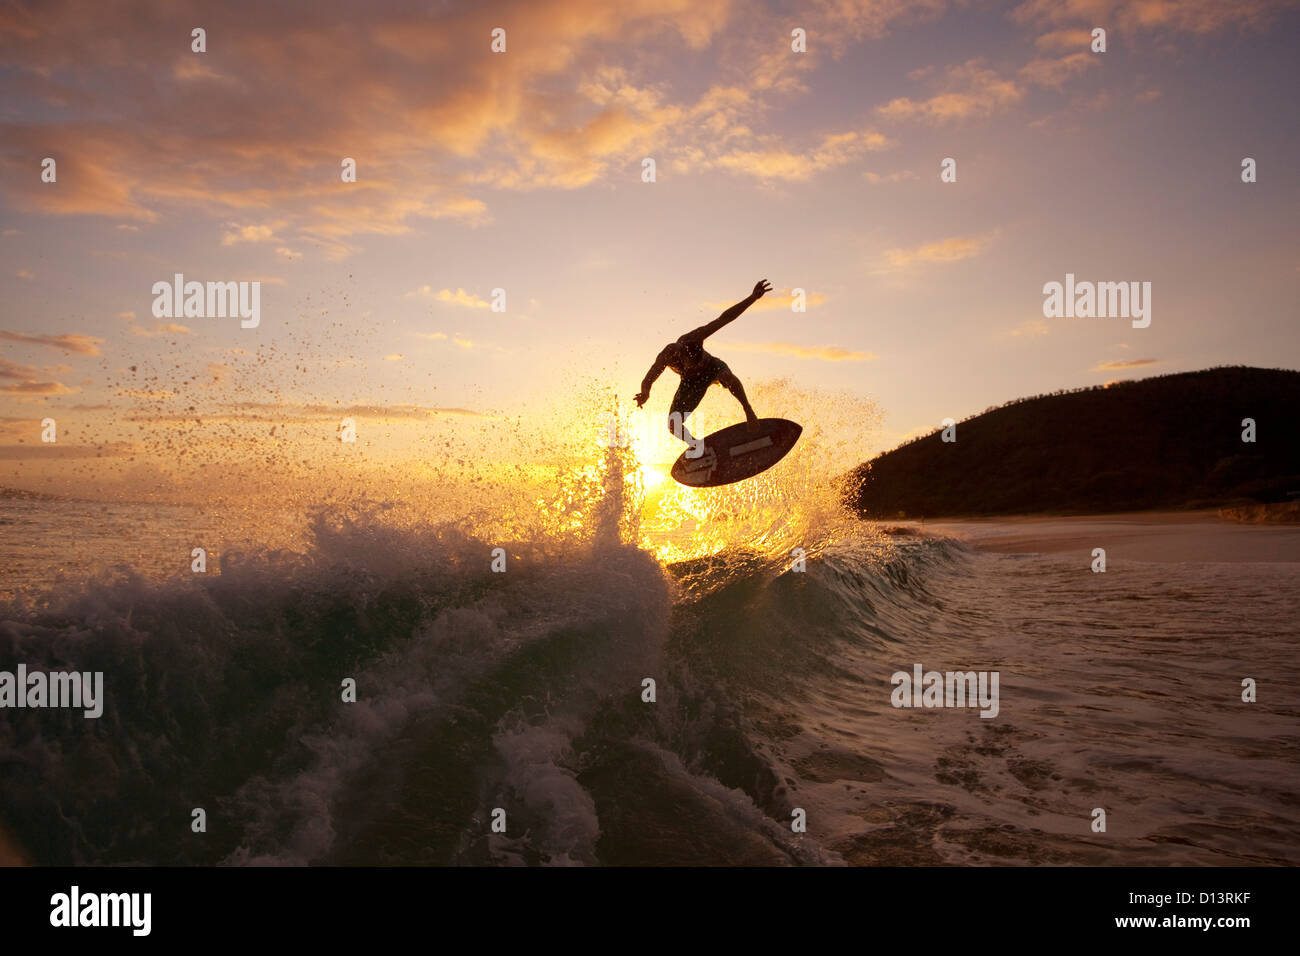 Hawaii Maui Makena, Skimboarder diventa grande aria Off una onda al tramonto Immagini Stock